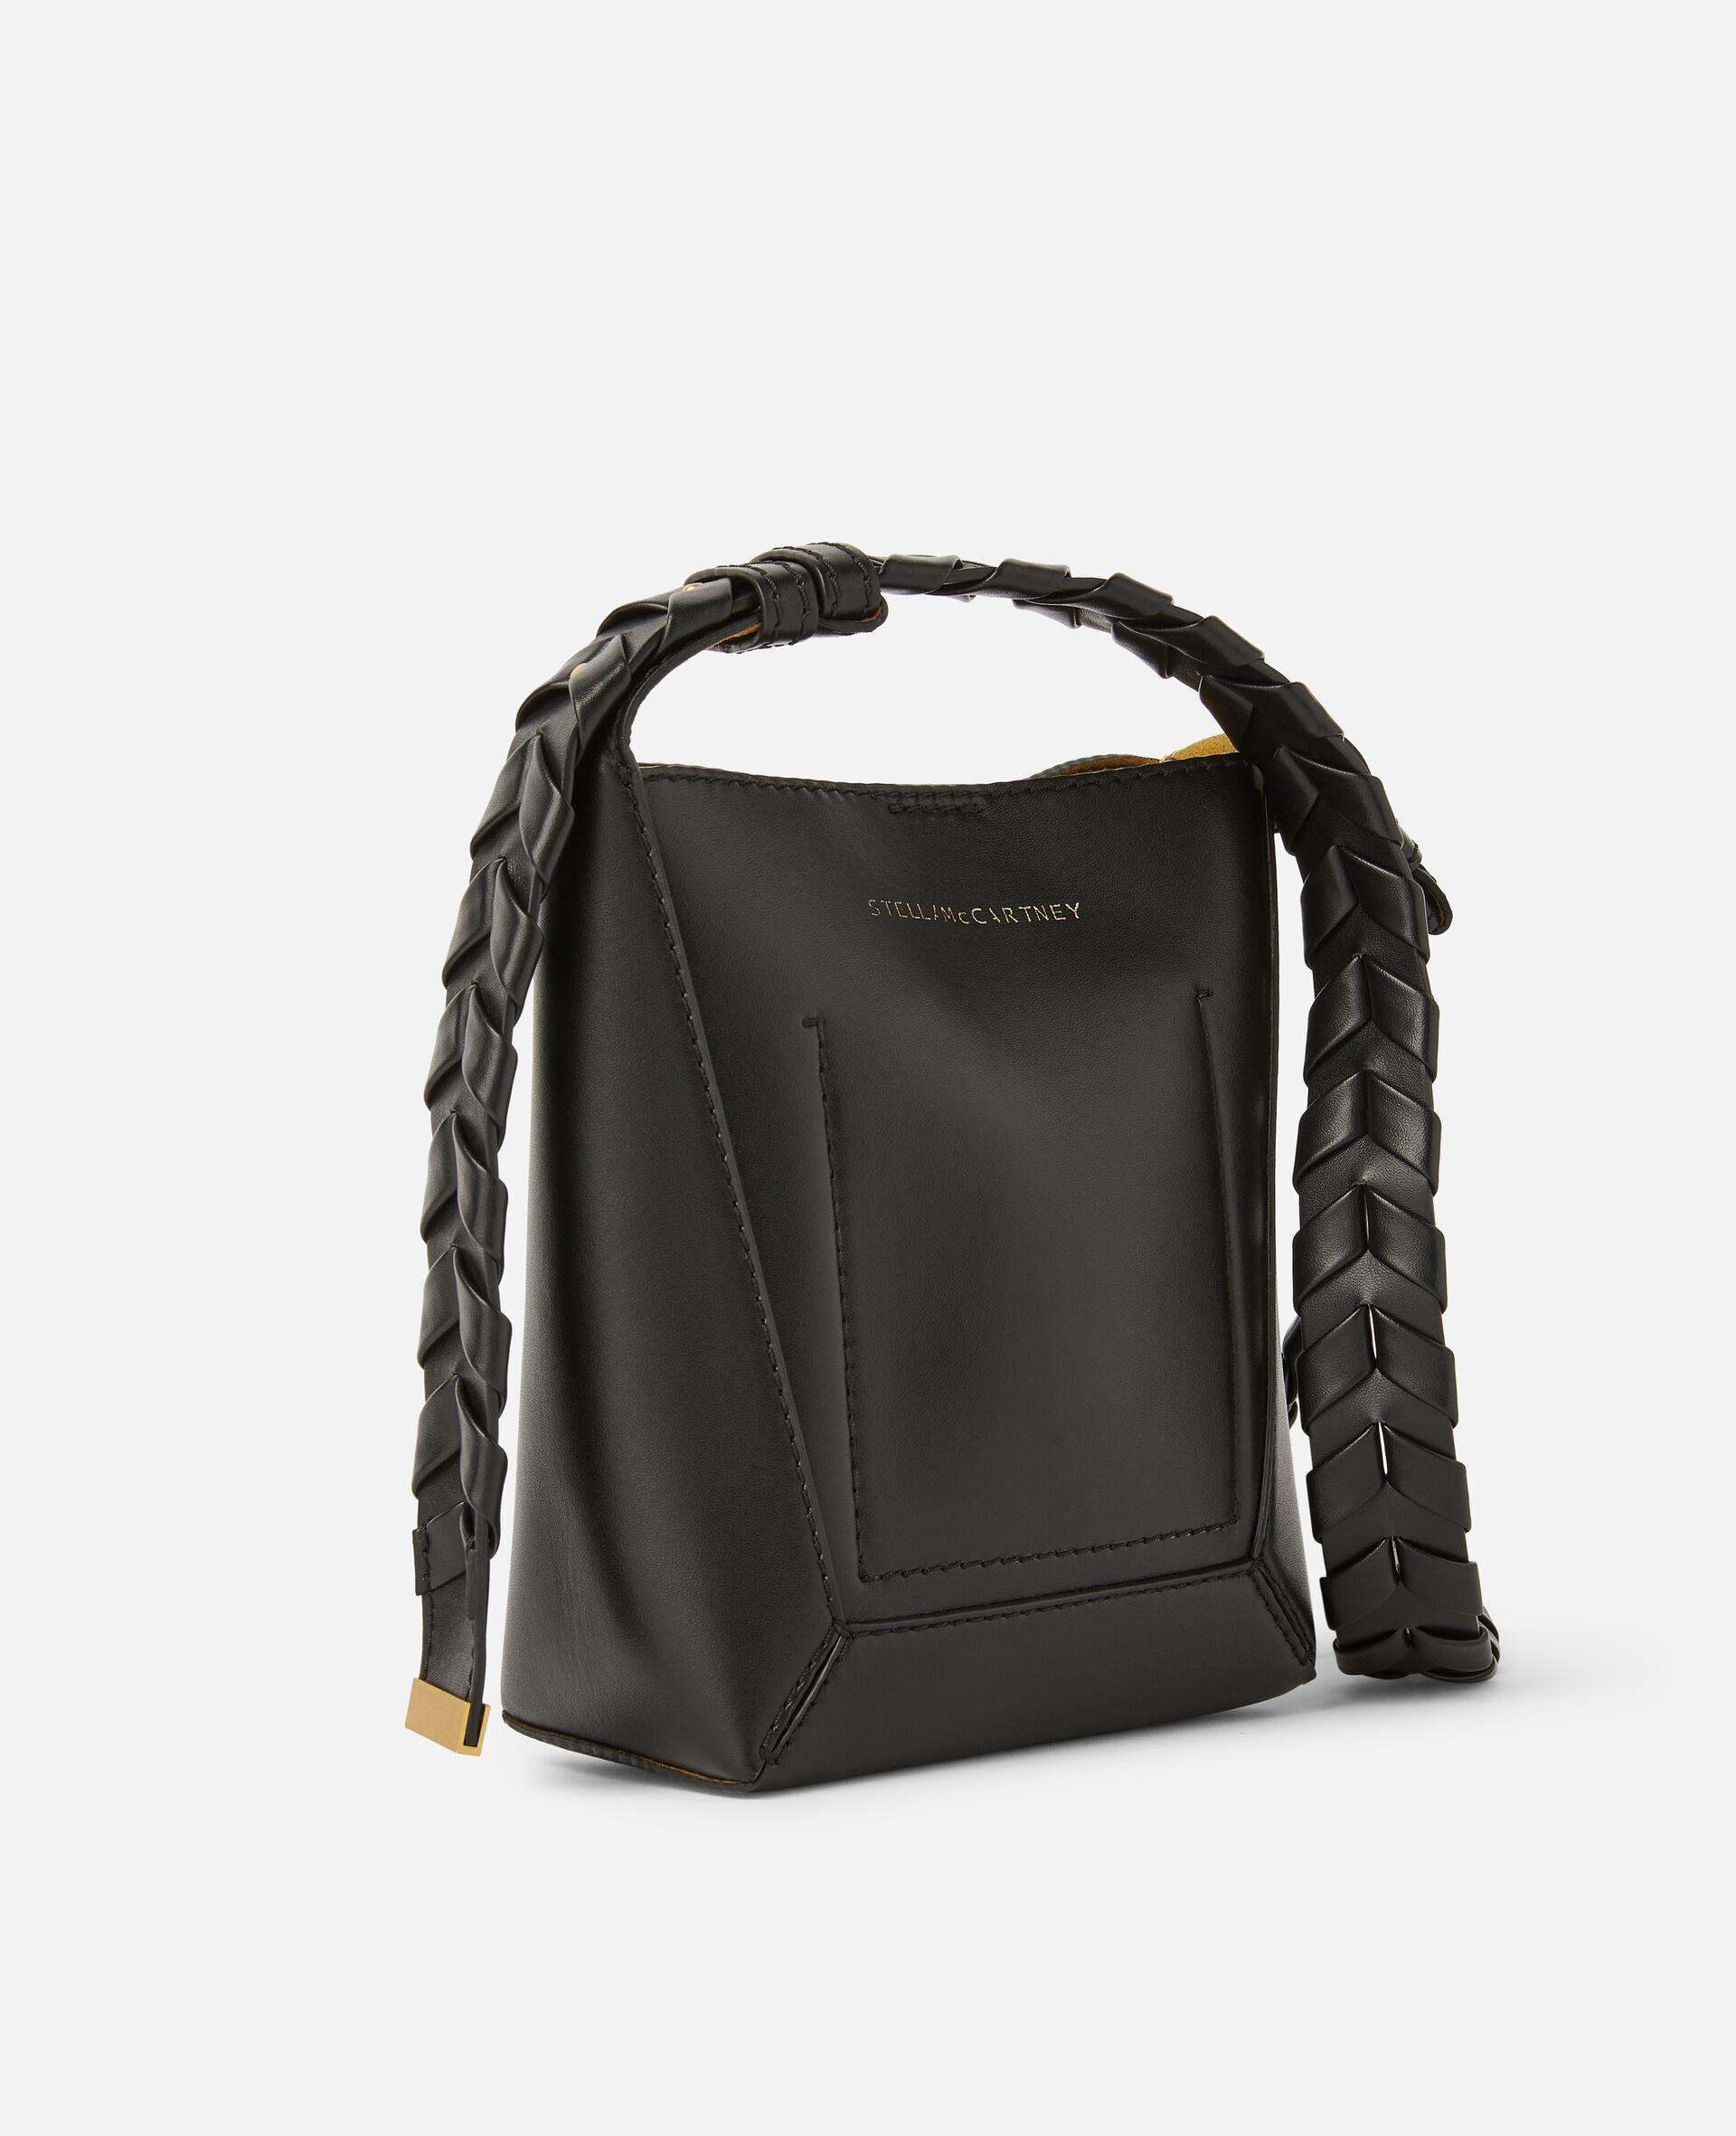 Petit sac Hobo-Noir-large image number 1